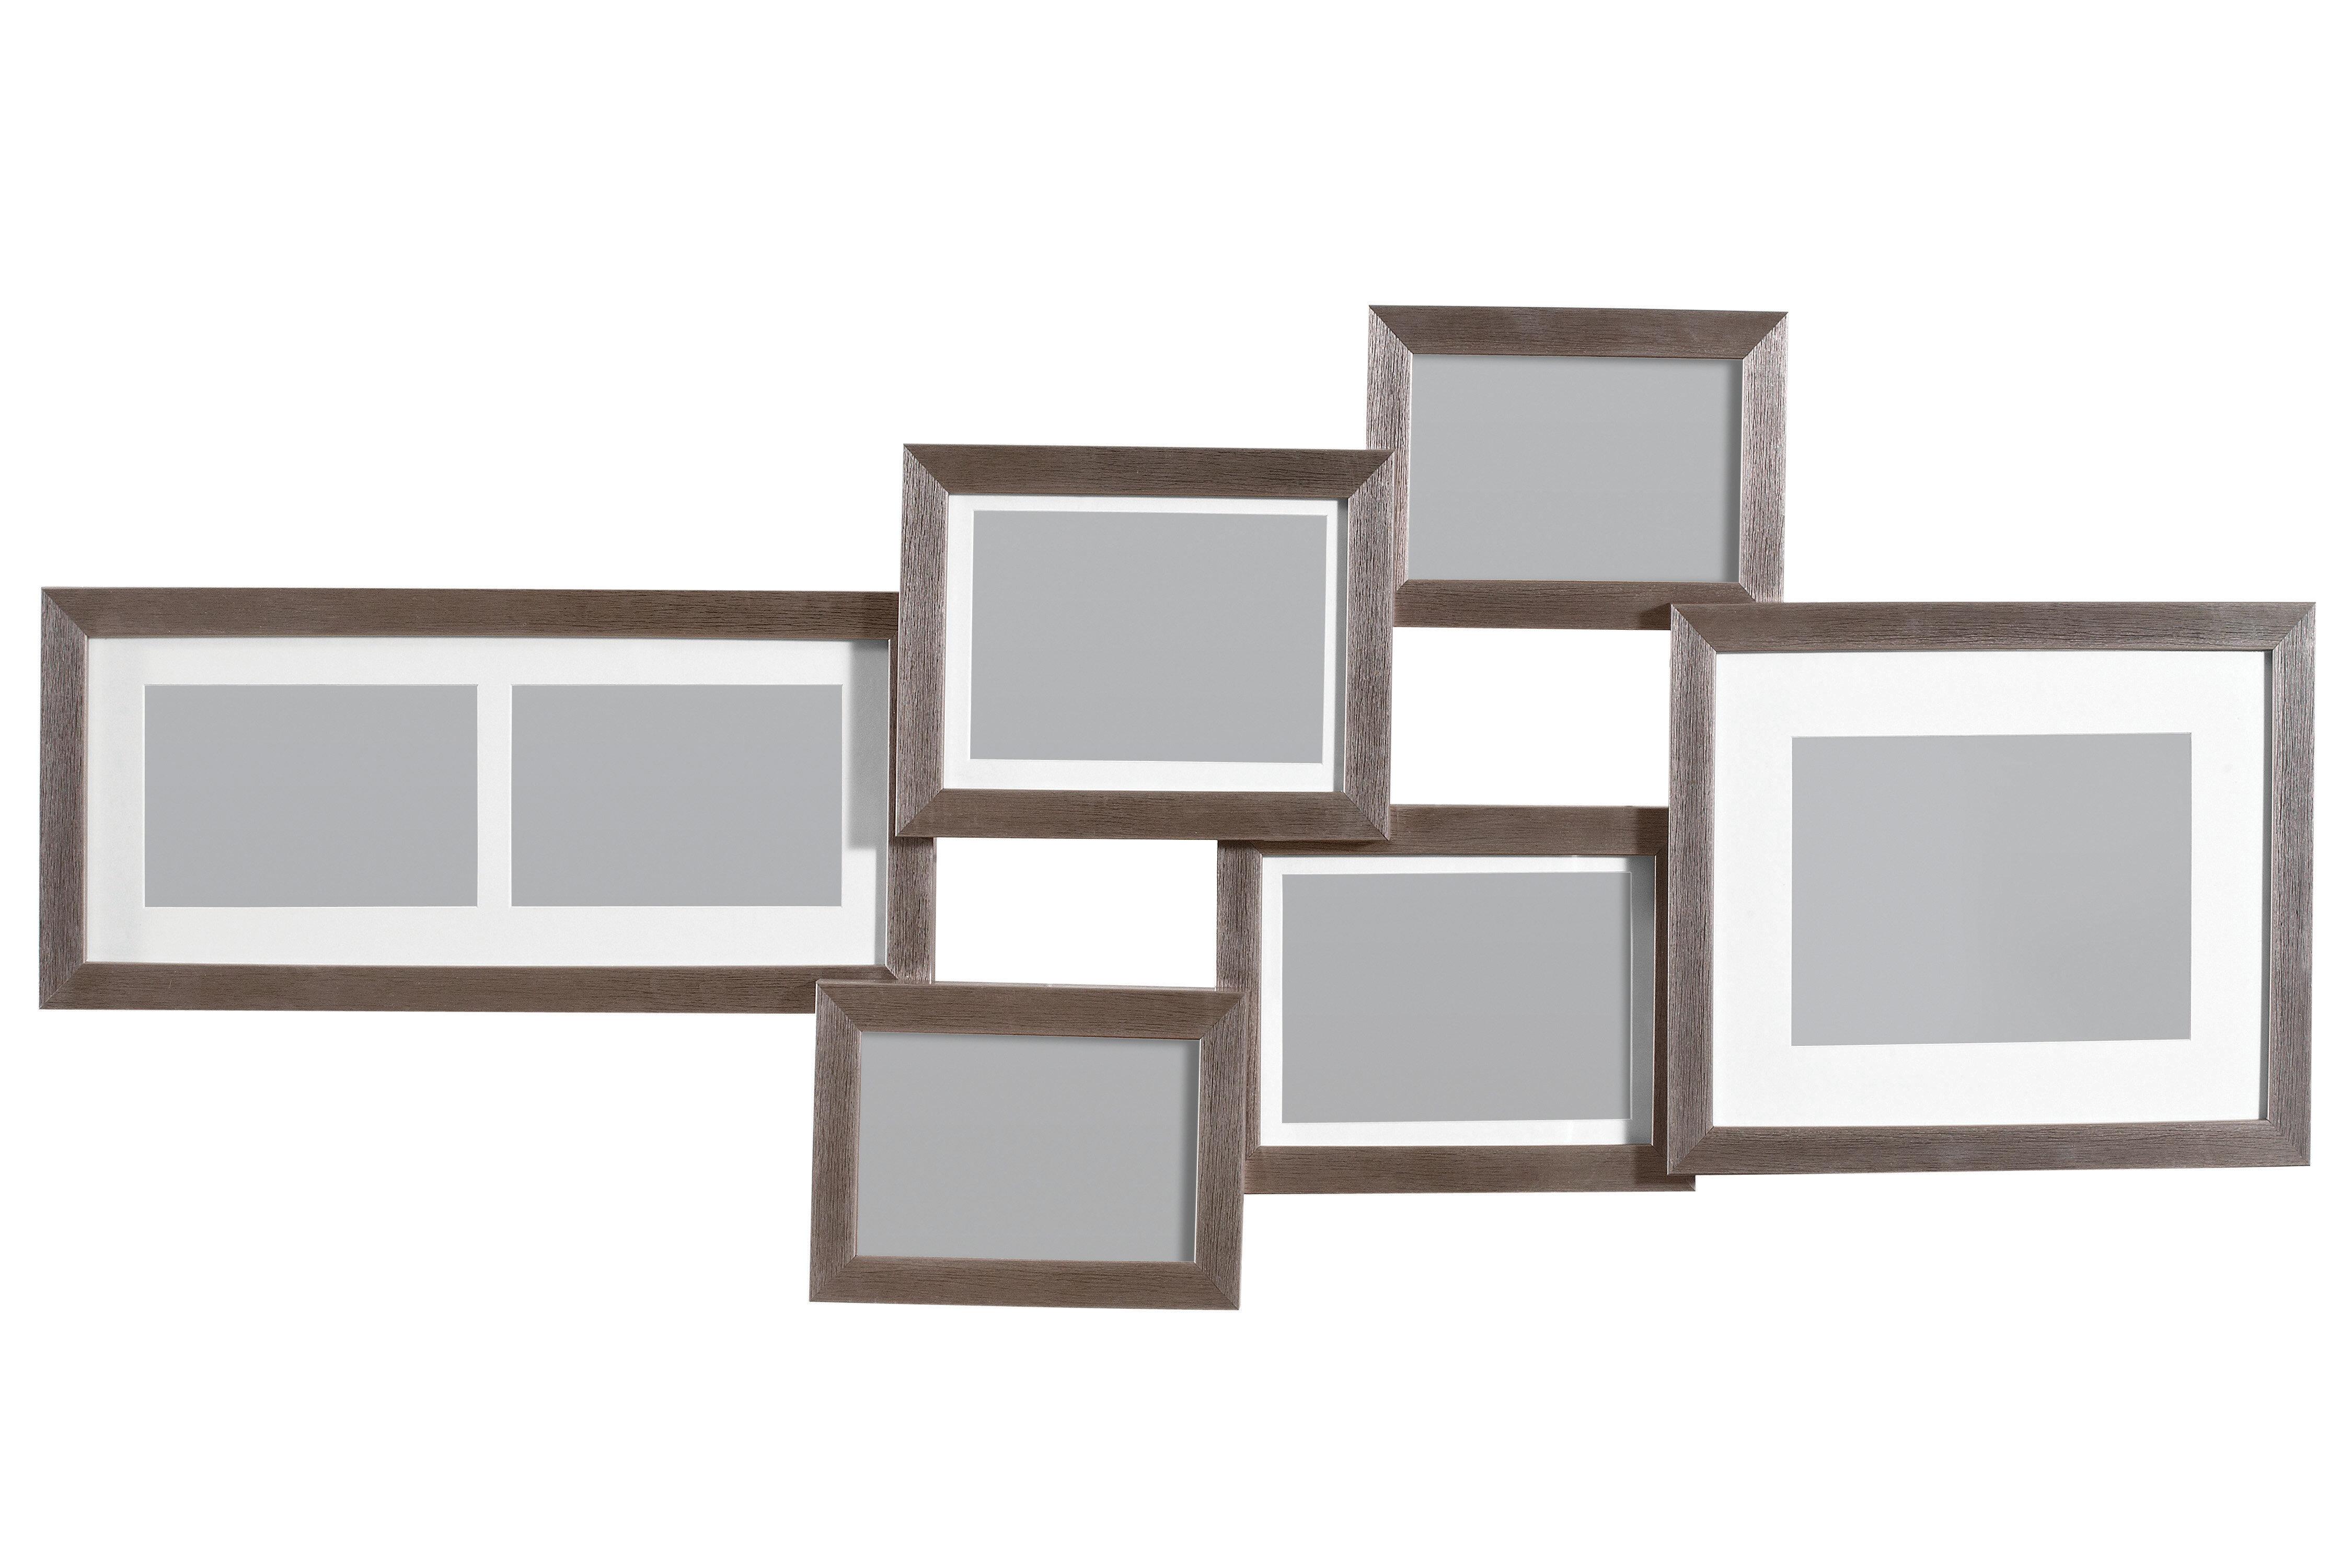 All Home Collage-Rahmen & Bewertungen   Wayfair.de